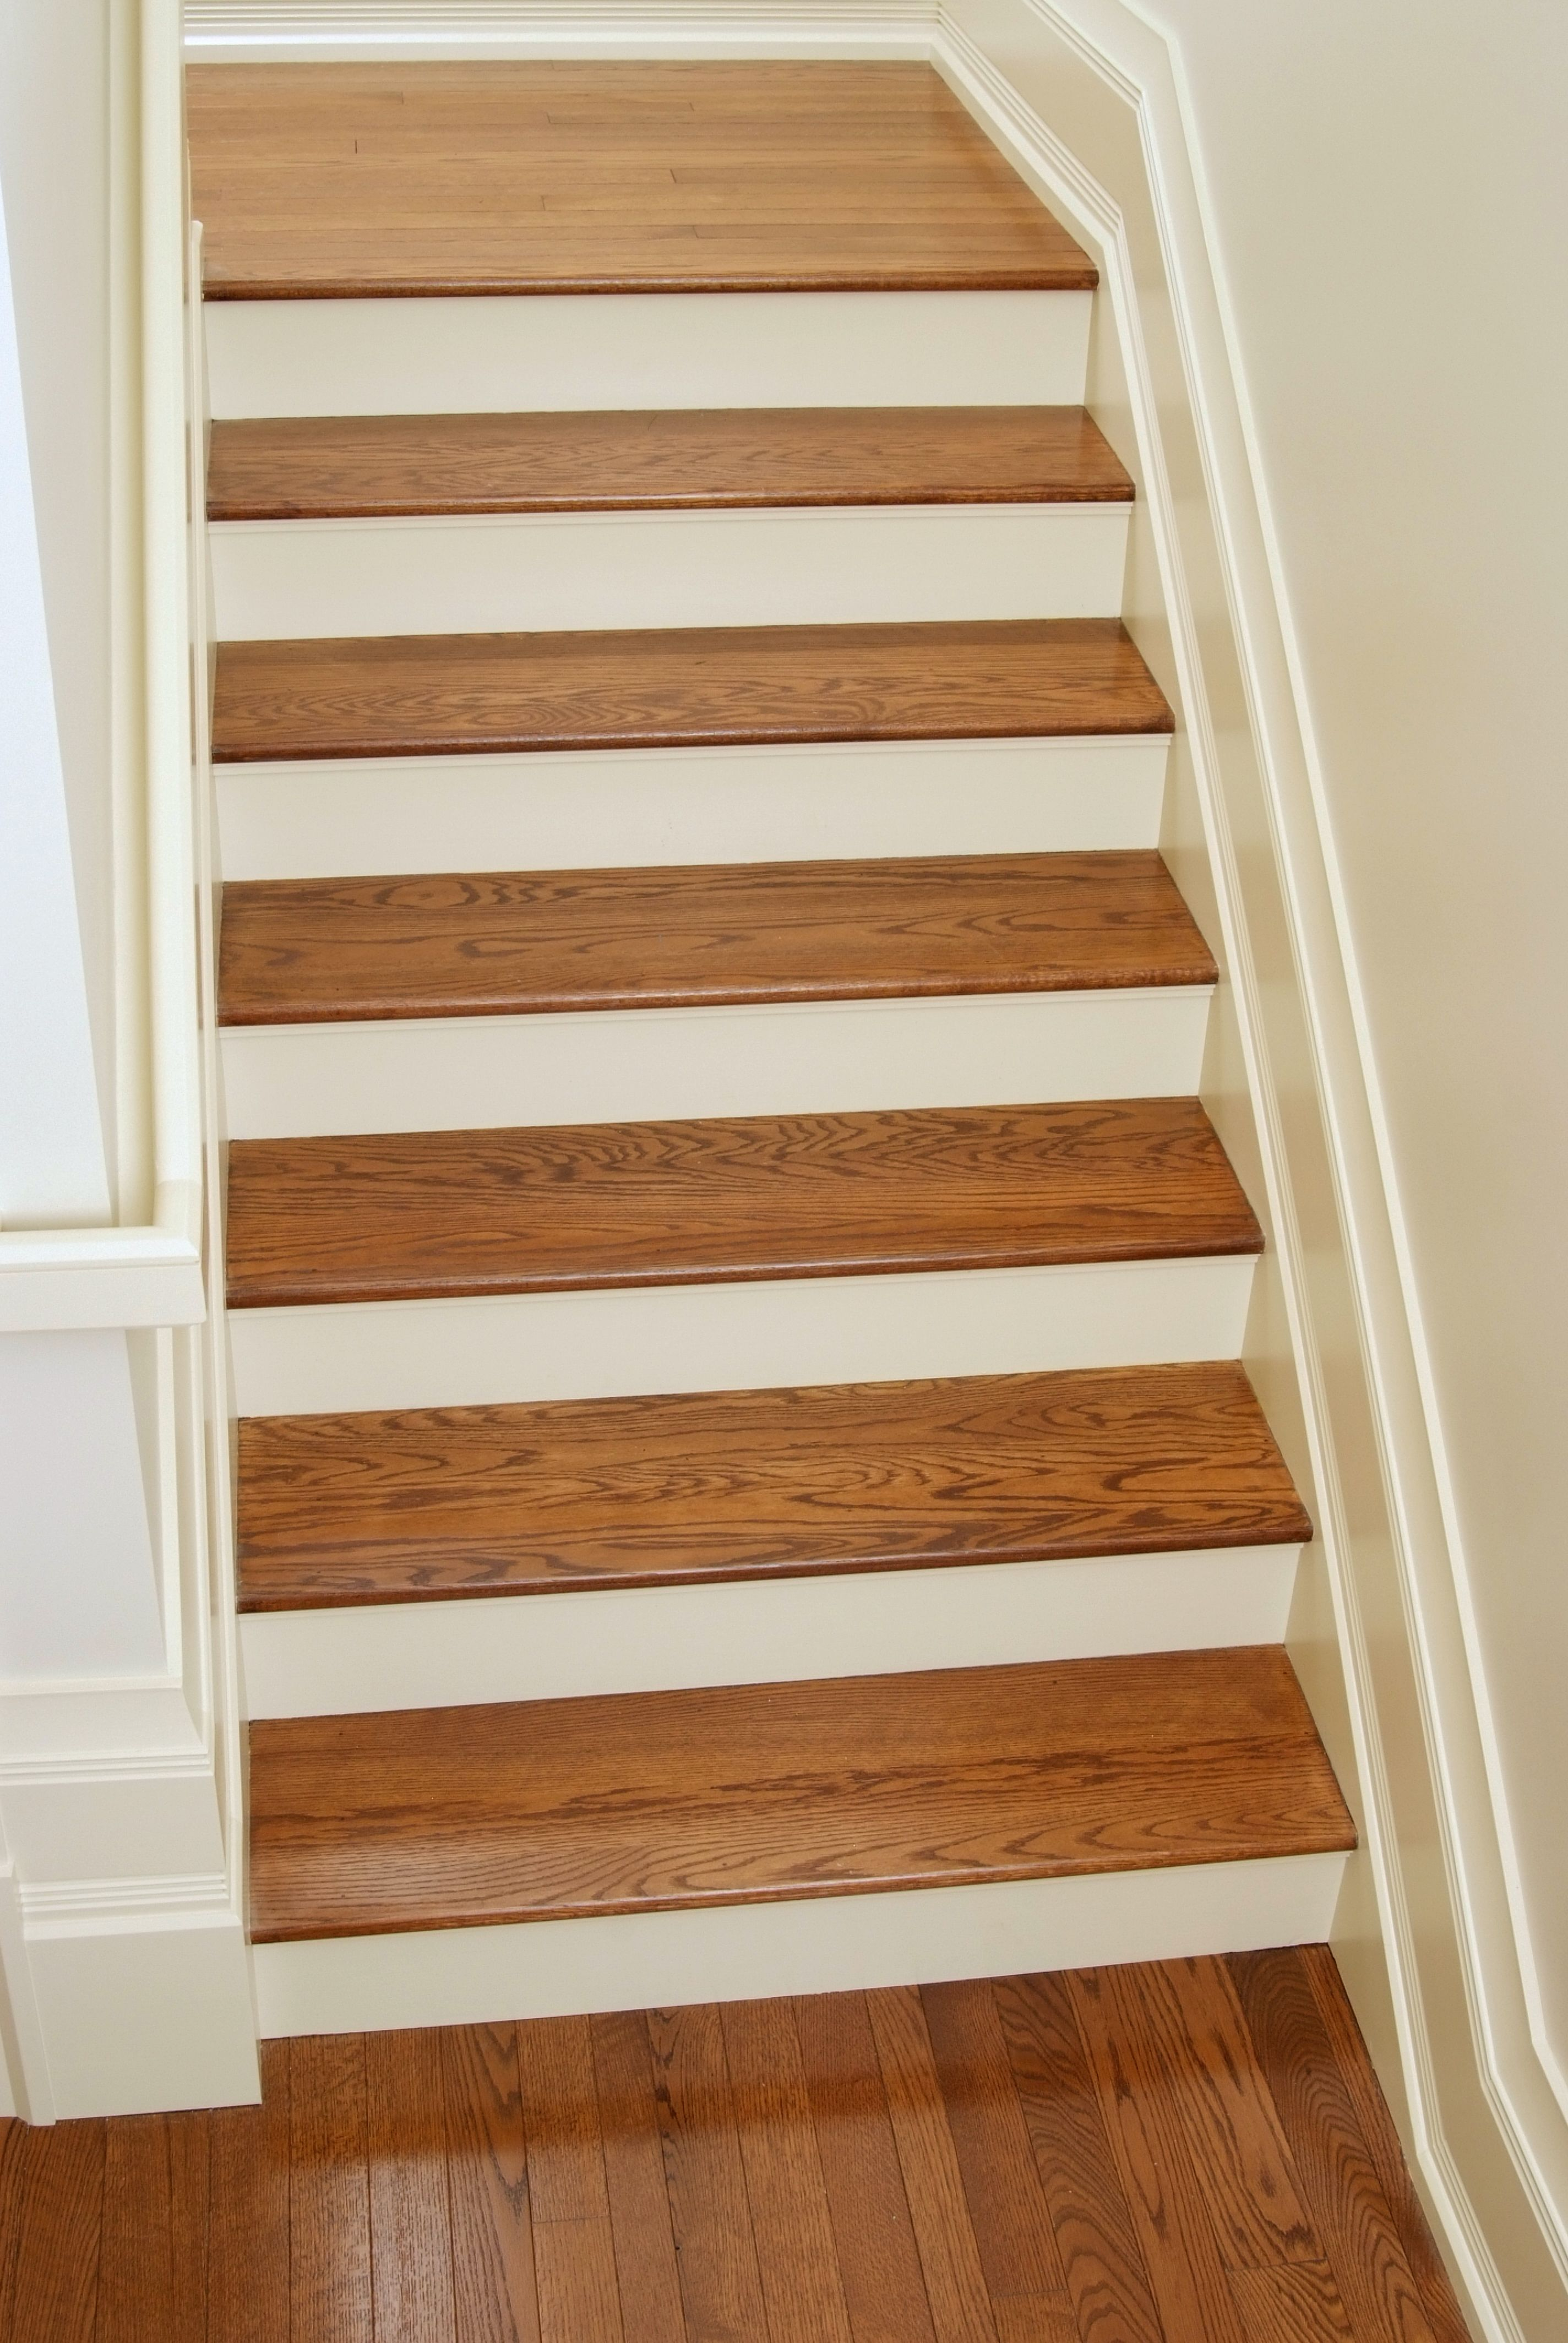 White Oak Stair Treads Wood Stair Treads Laminate Stairs Oak | Hardwood Floor Stair Treads | Wooden | Hand Scraped | Redwood | Pergo Floor | Laminate Flooring